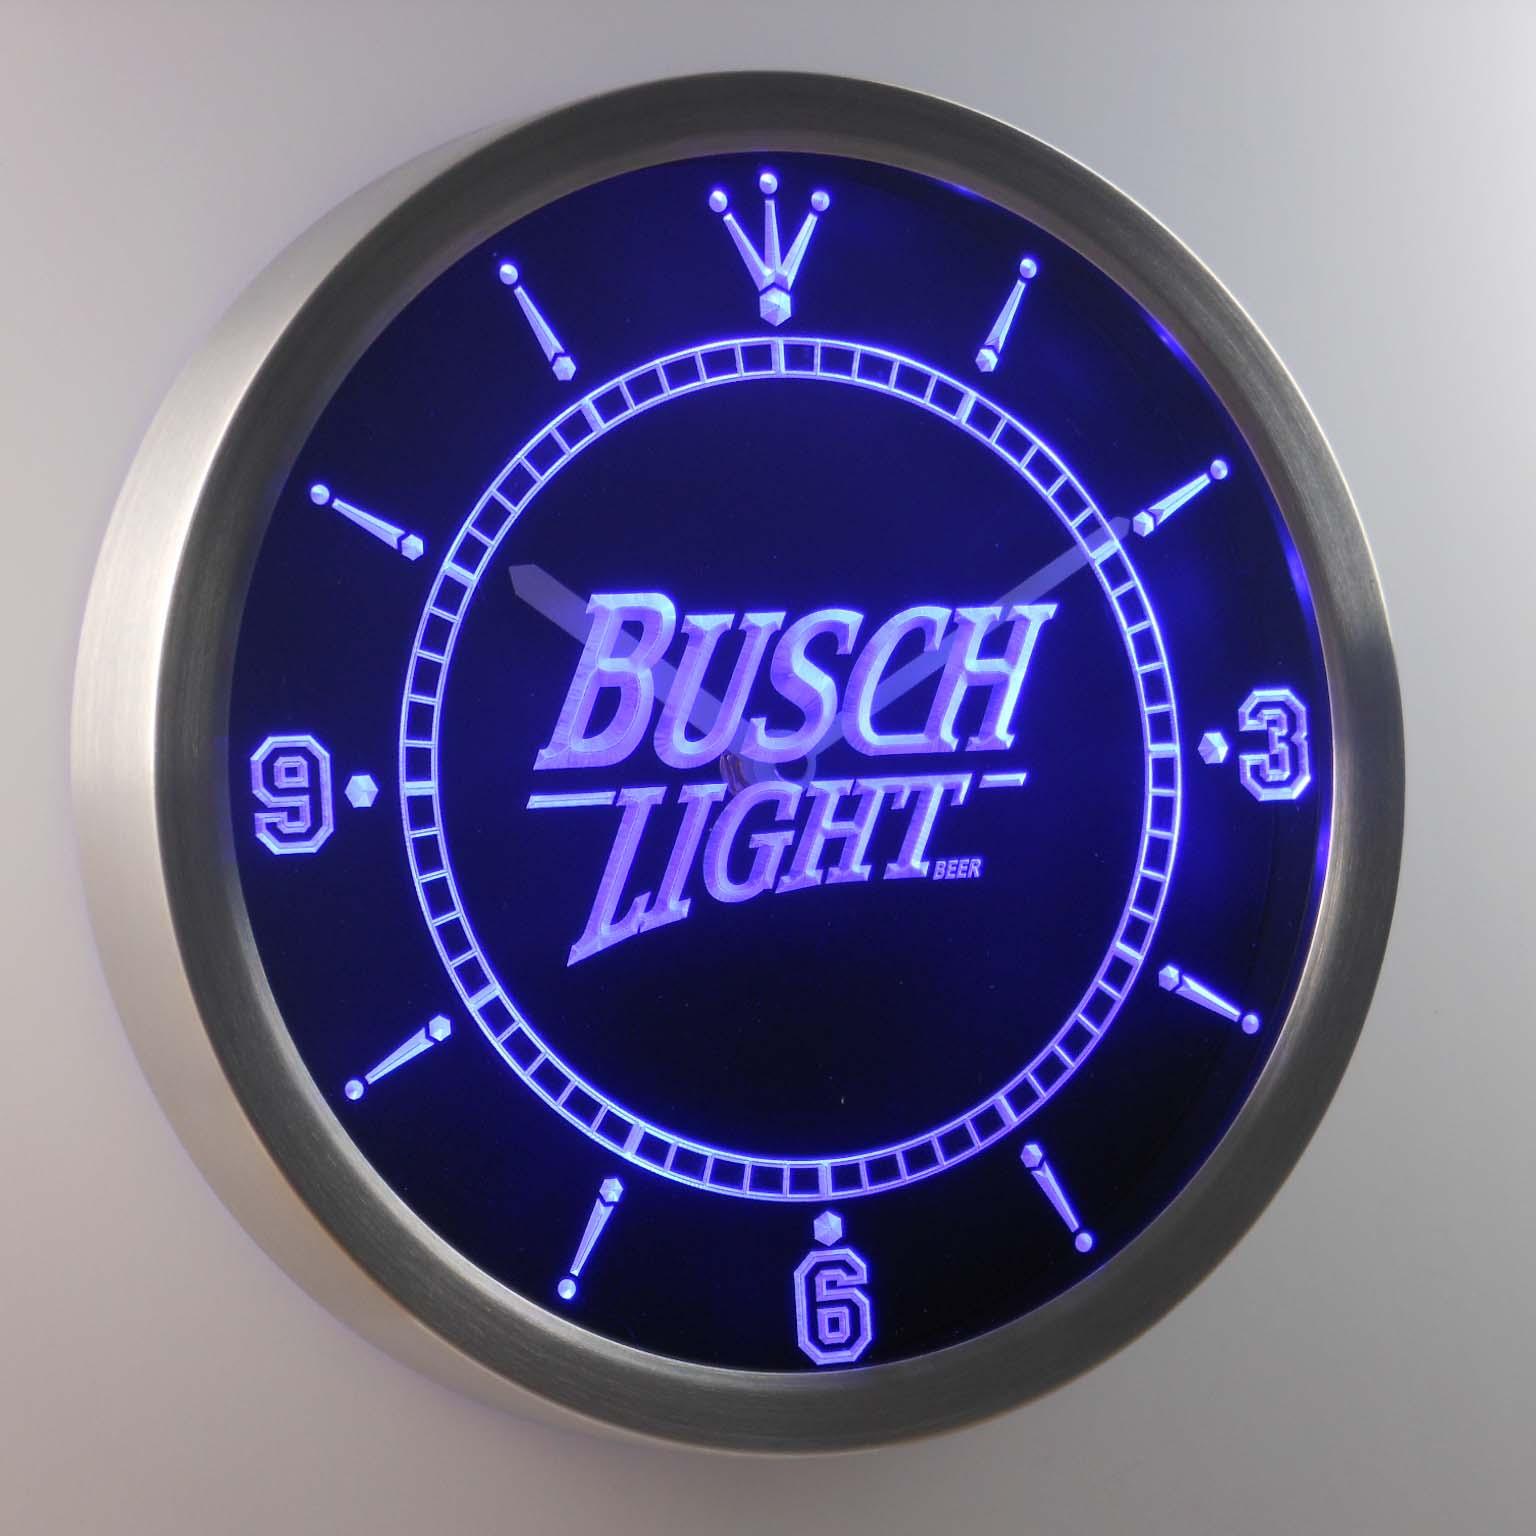 Nc0481 Busch Light Beer Neon Sign LED Wall Clock